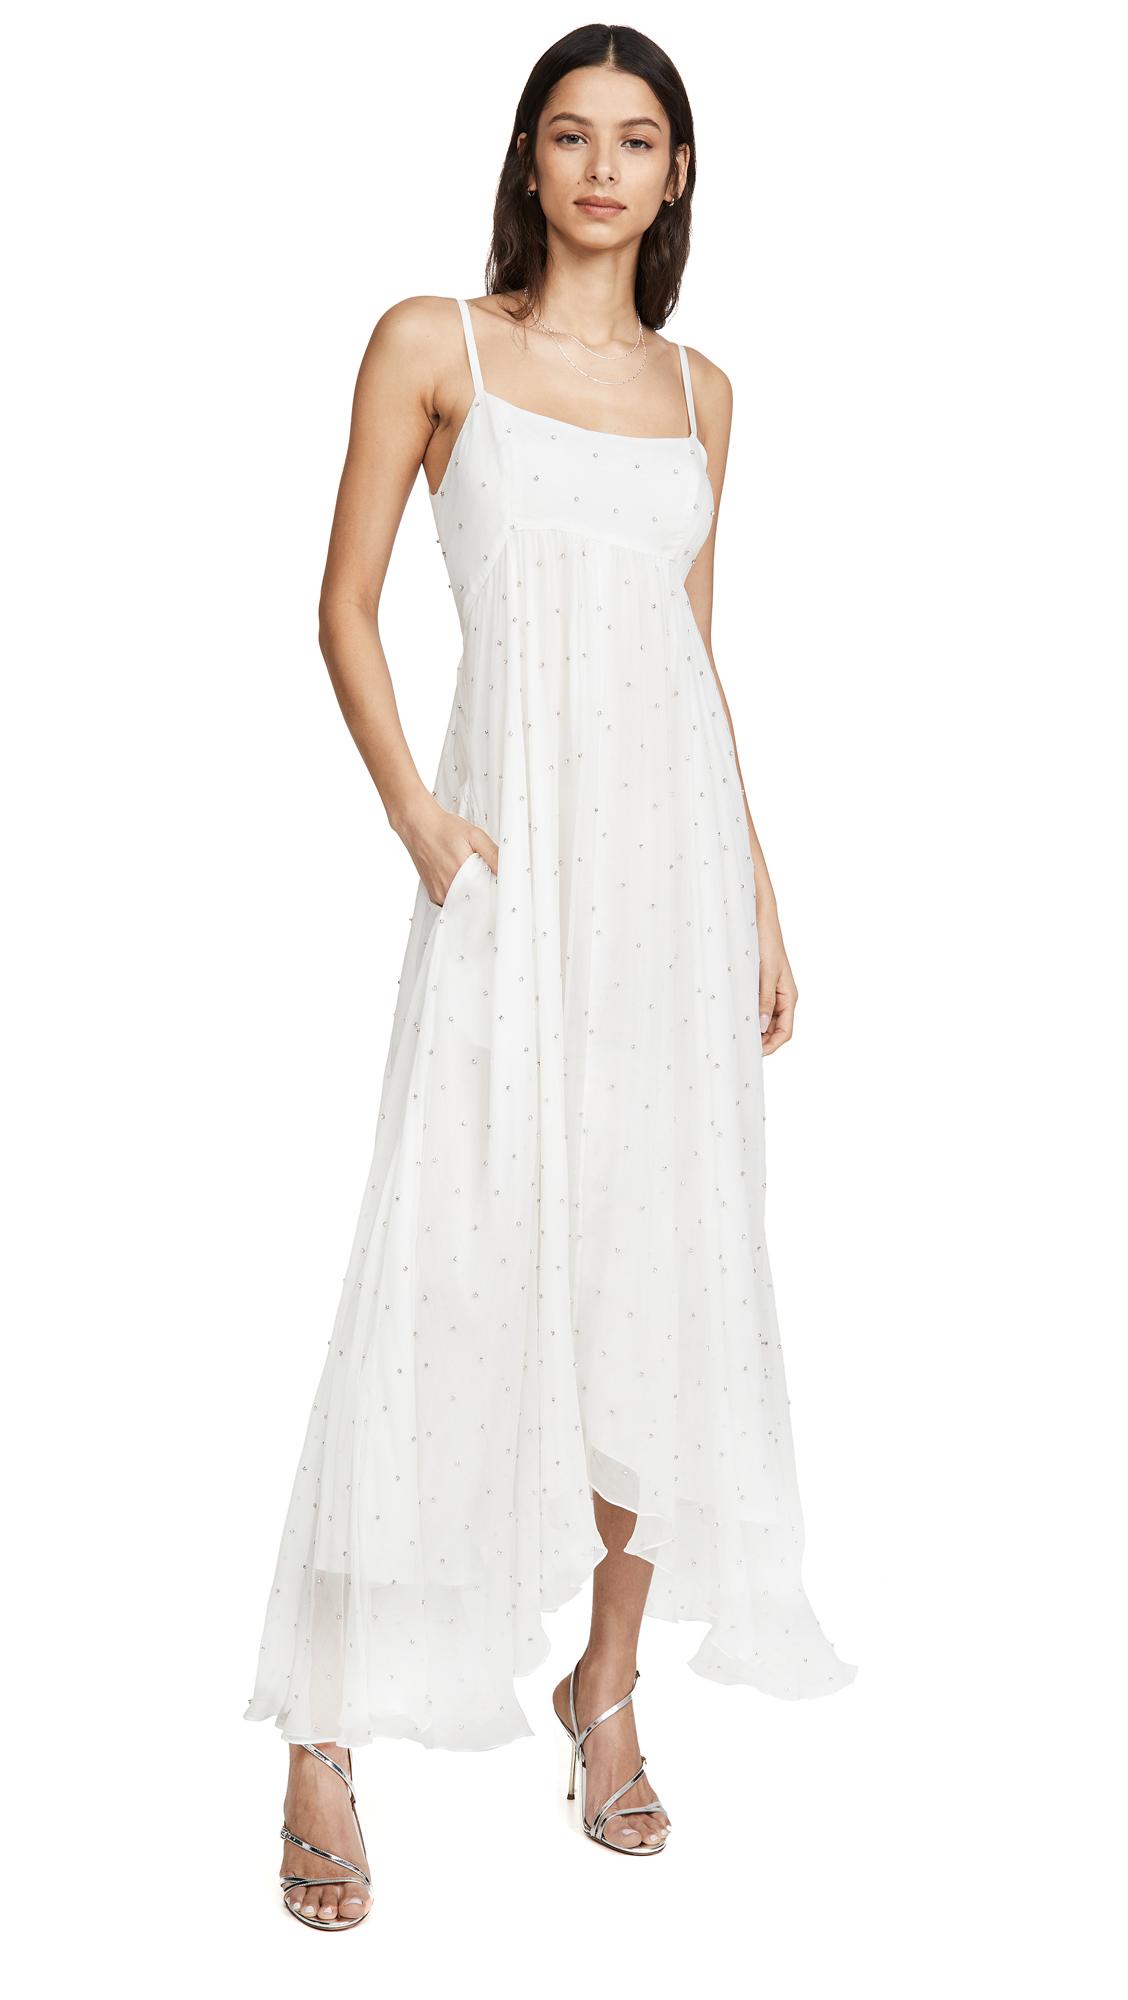 Azeeza White Dress with Cystals - 40% Off Sale